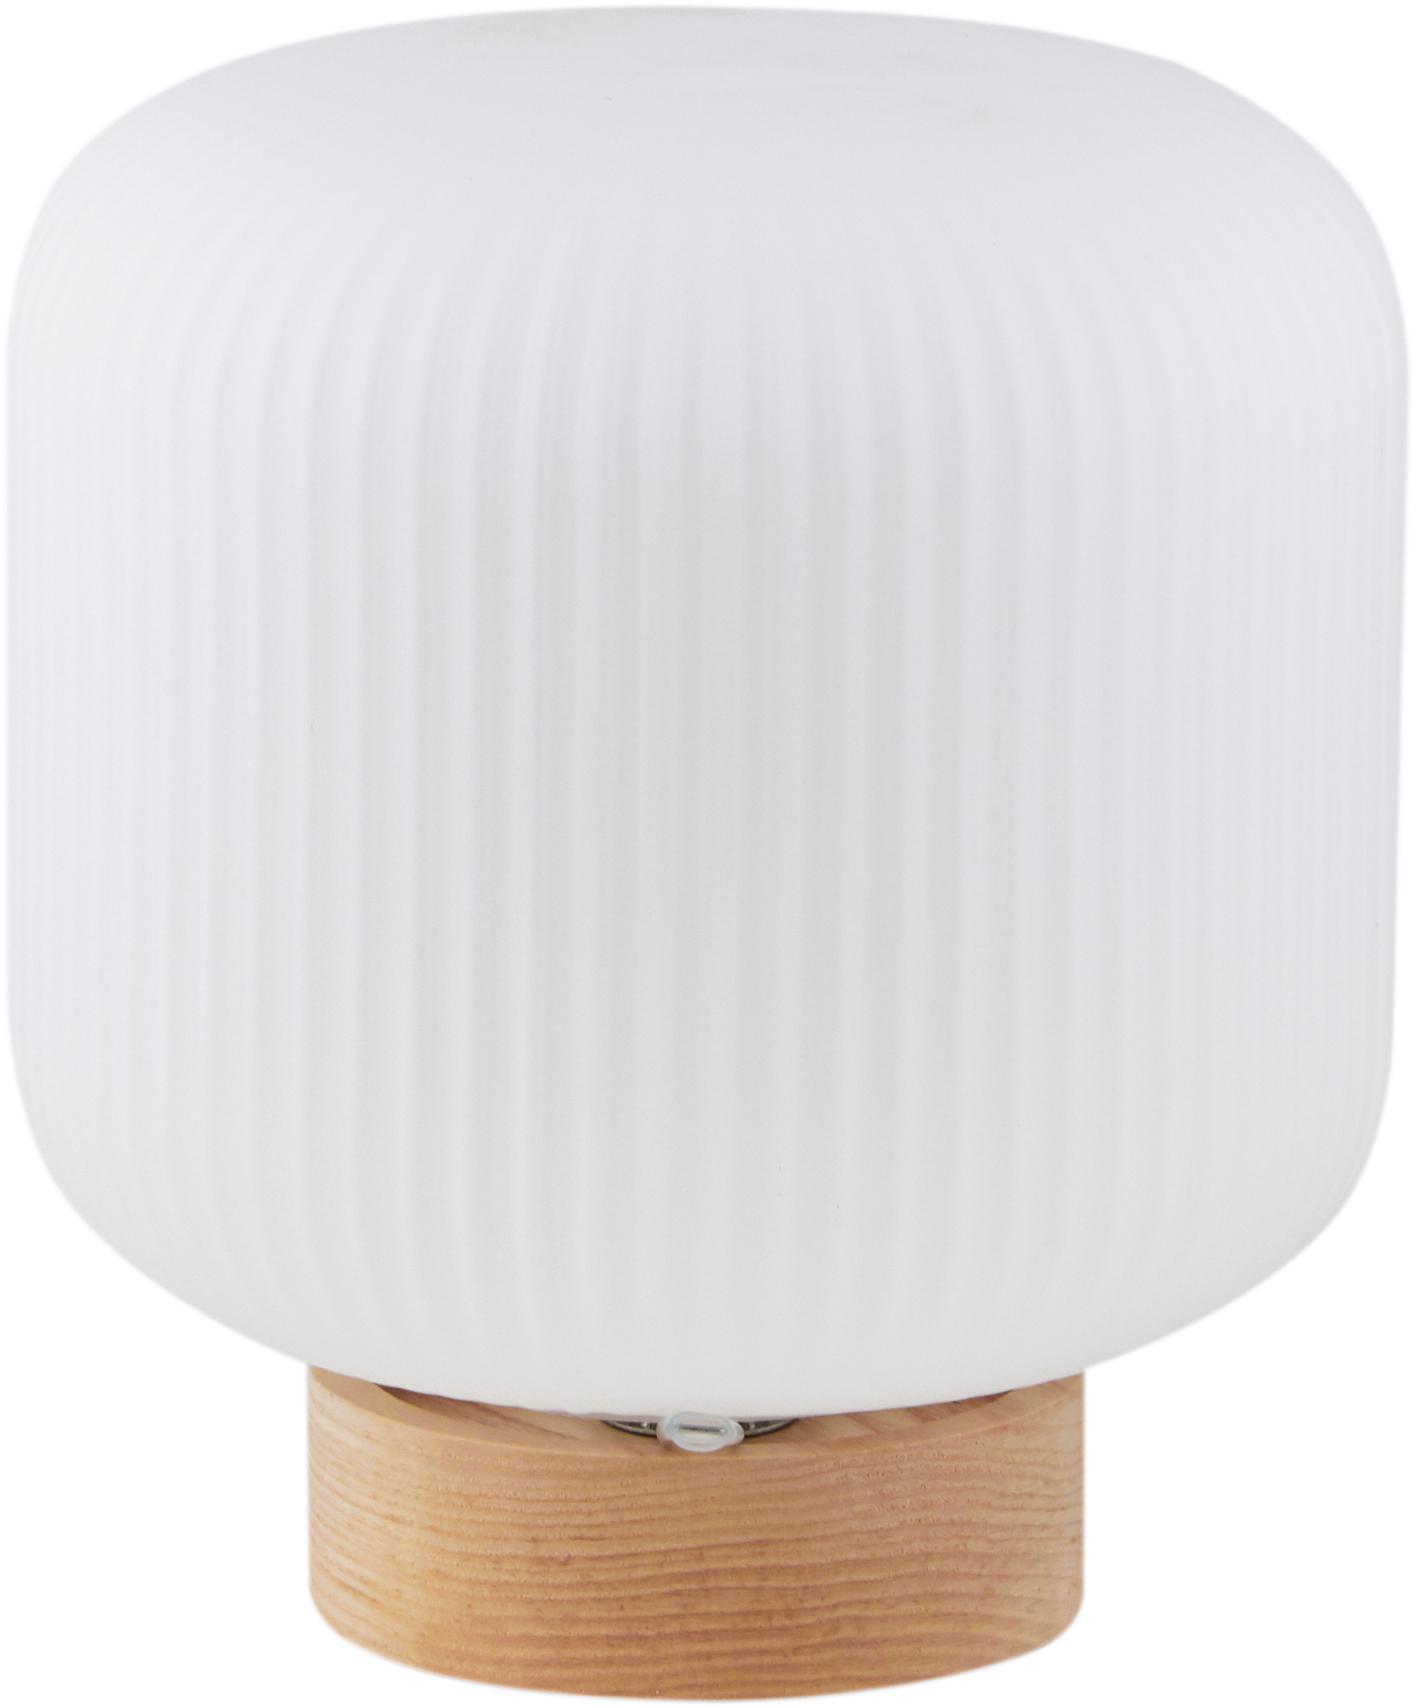 Tafellamp Milford, Opaalglas, hout, Opaalwit, houtkleurig, Ø 20 x H 21 cm